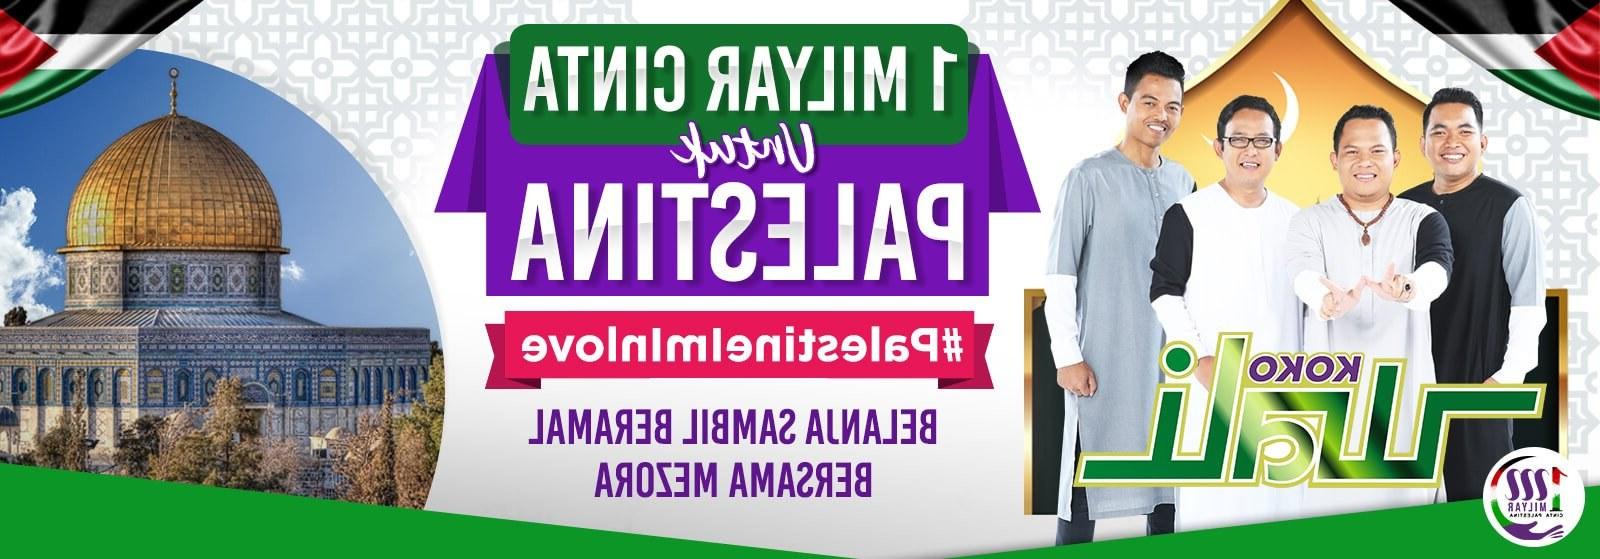 Model butik Baju Pengantin Muslimah Whdr Dress Busana Muslim Gamis Koko Dan Hijab Mezora